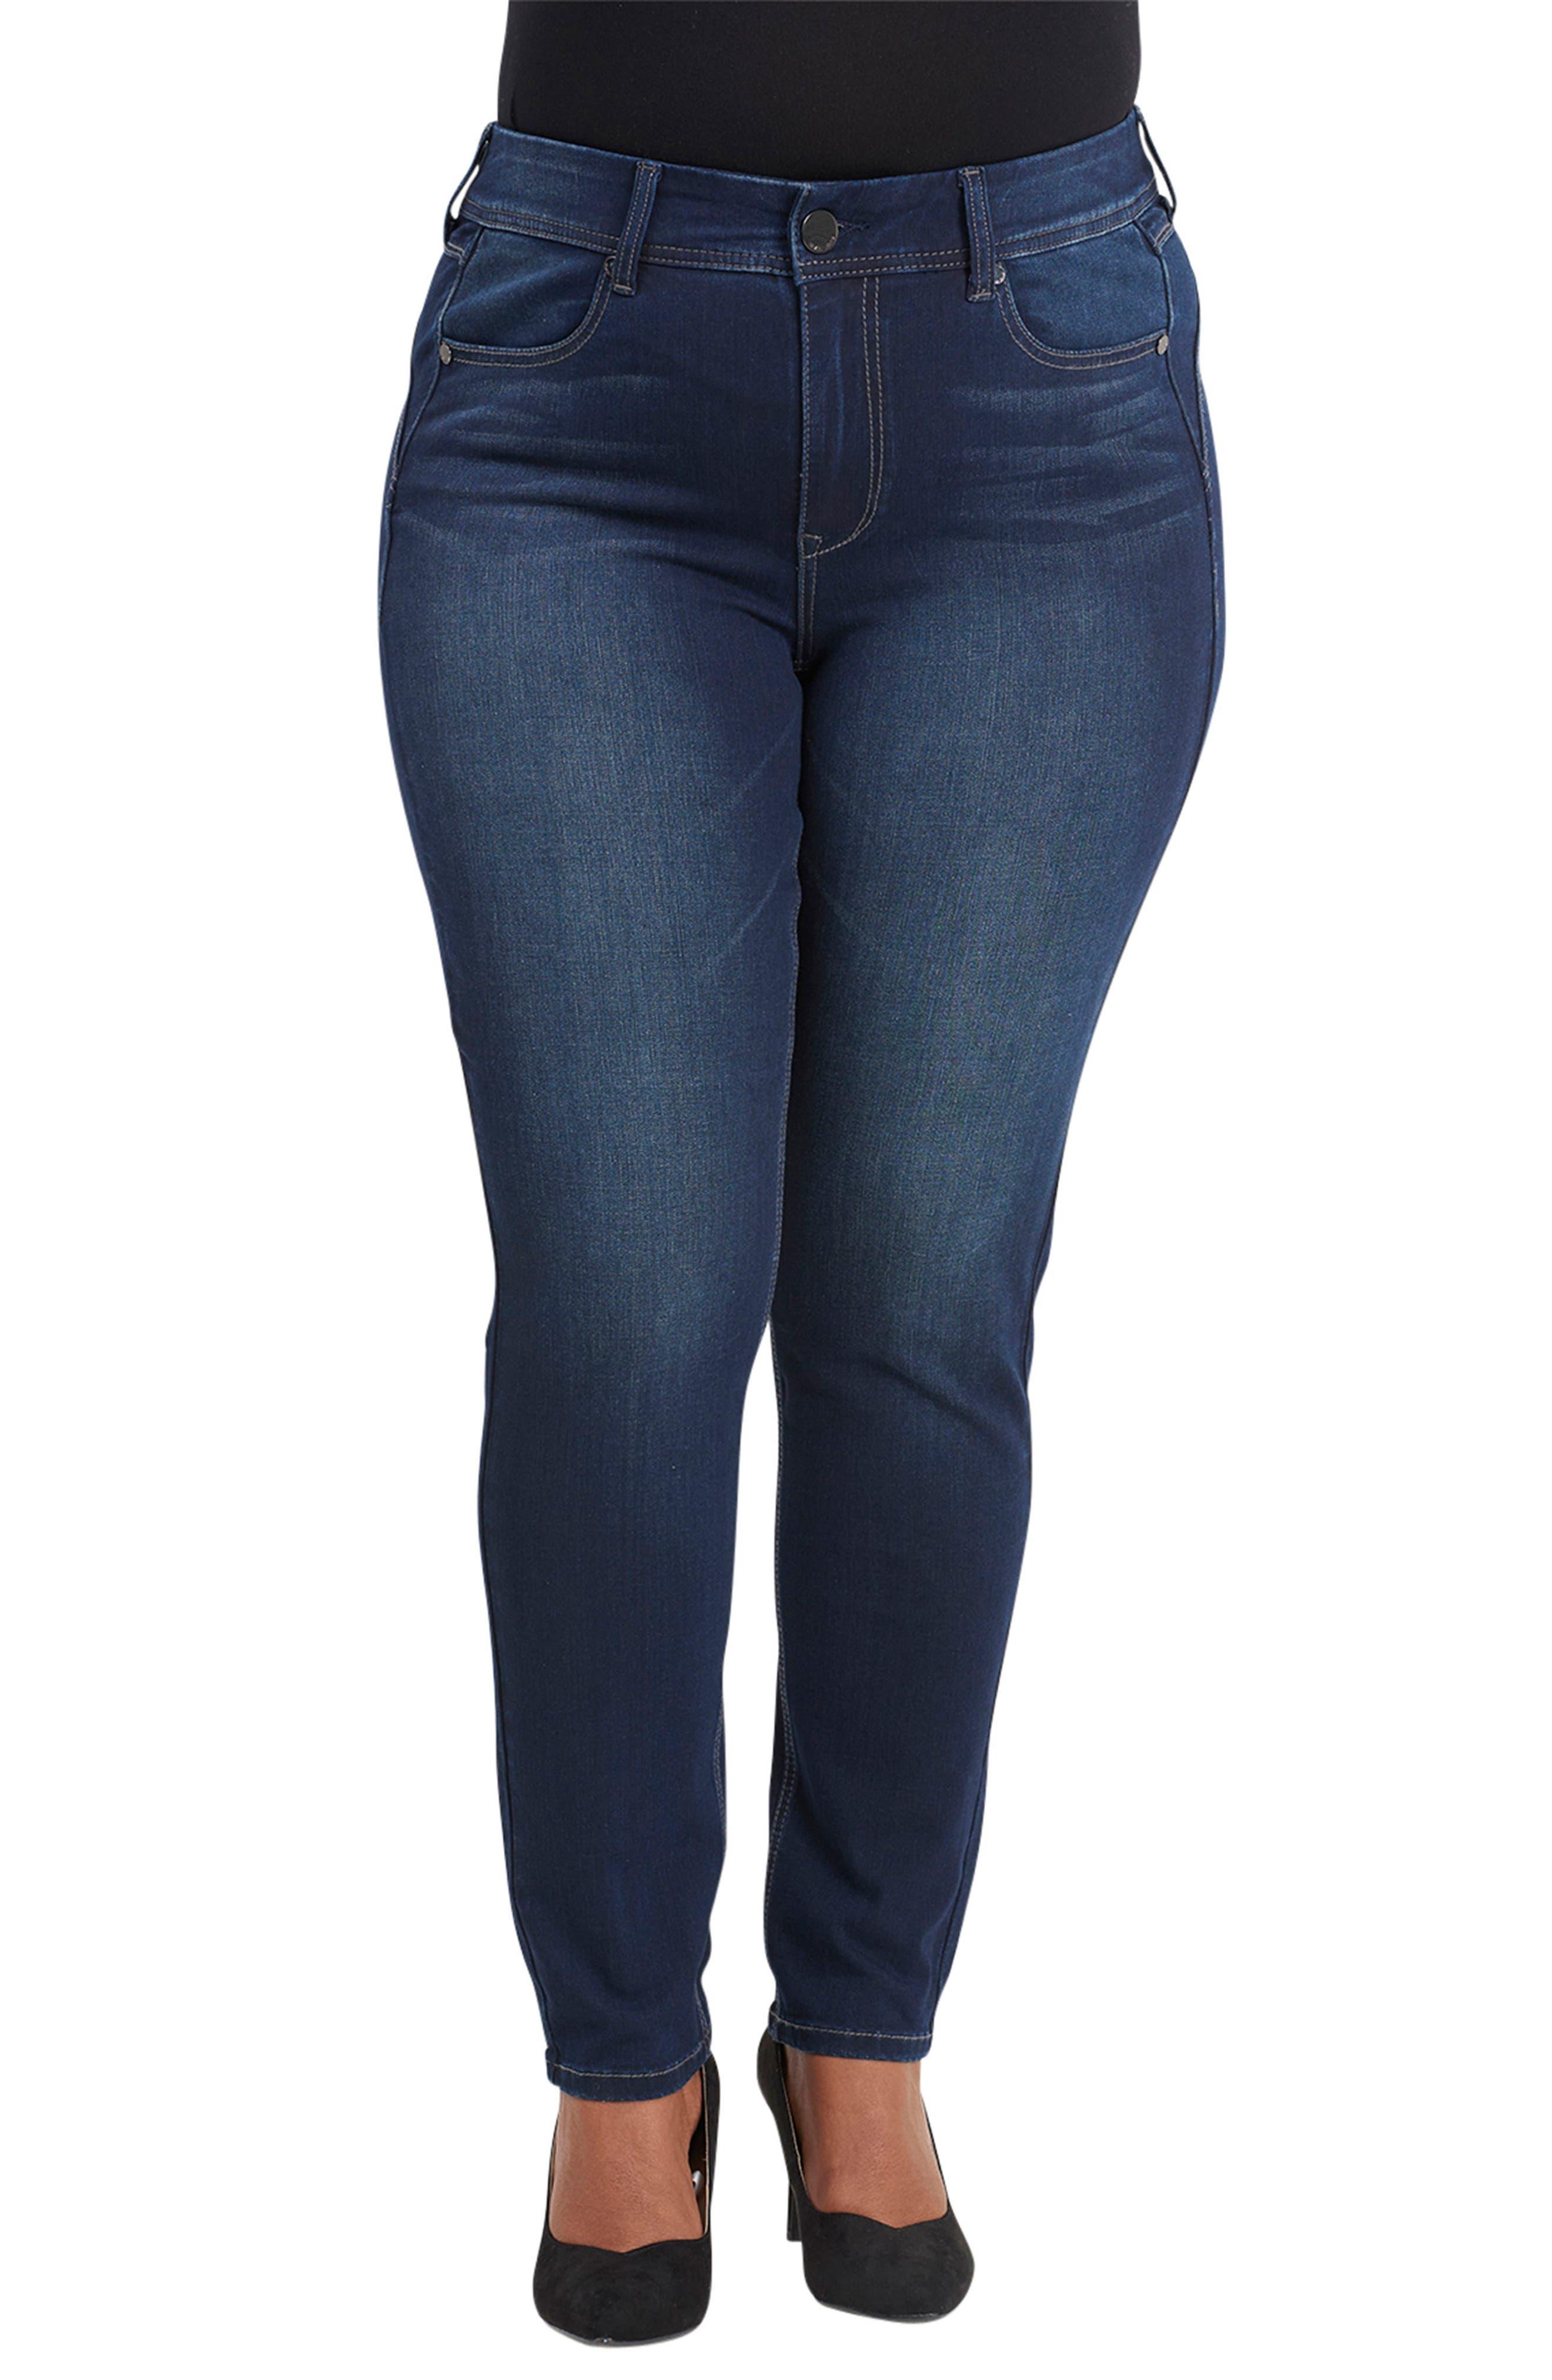 Seven7 Bootyshaper Skinny Jeans (Plus Size)